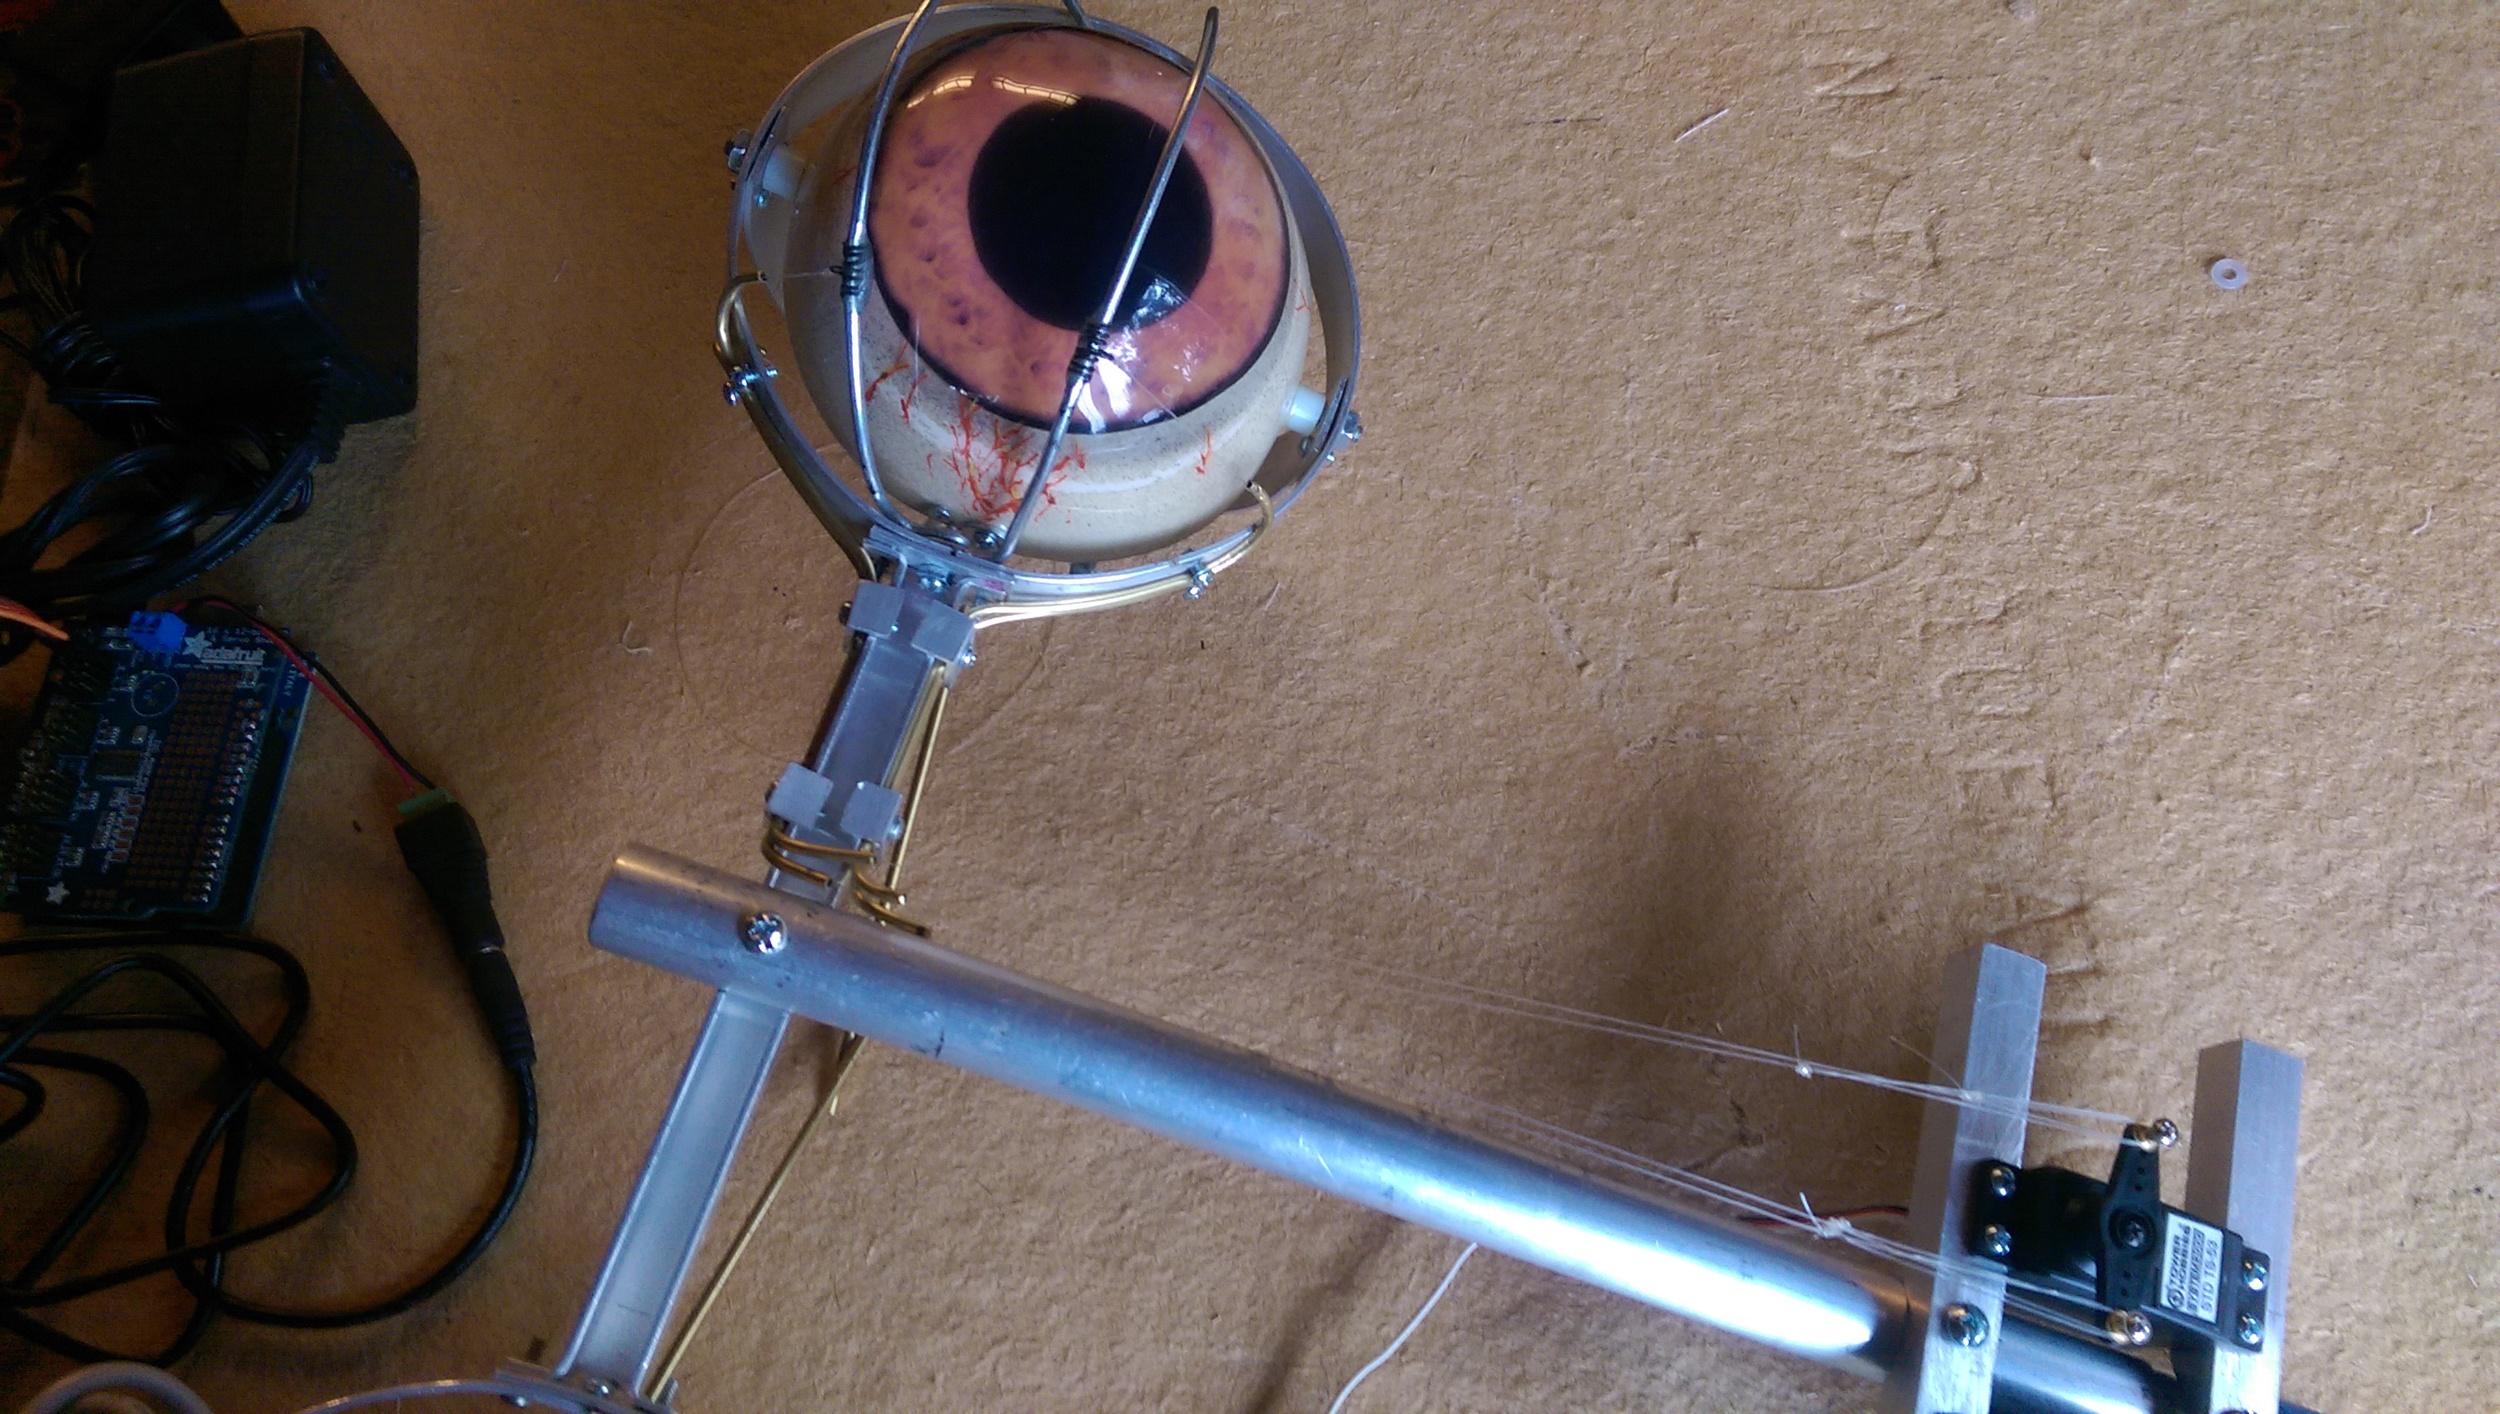 The final eye blink mechanism for the left eye ofthe Ithorian